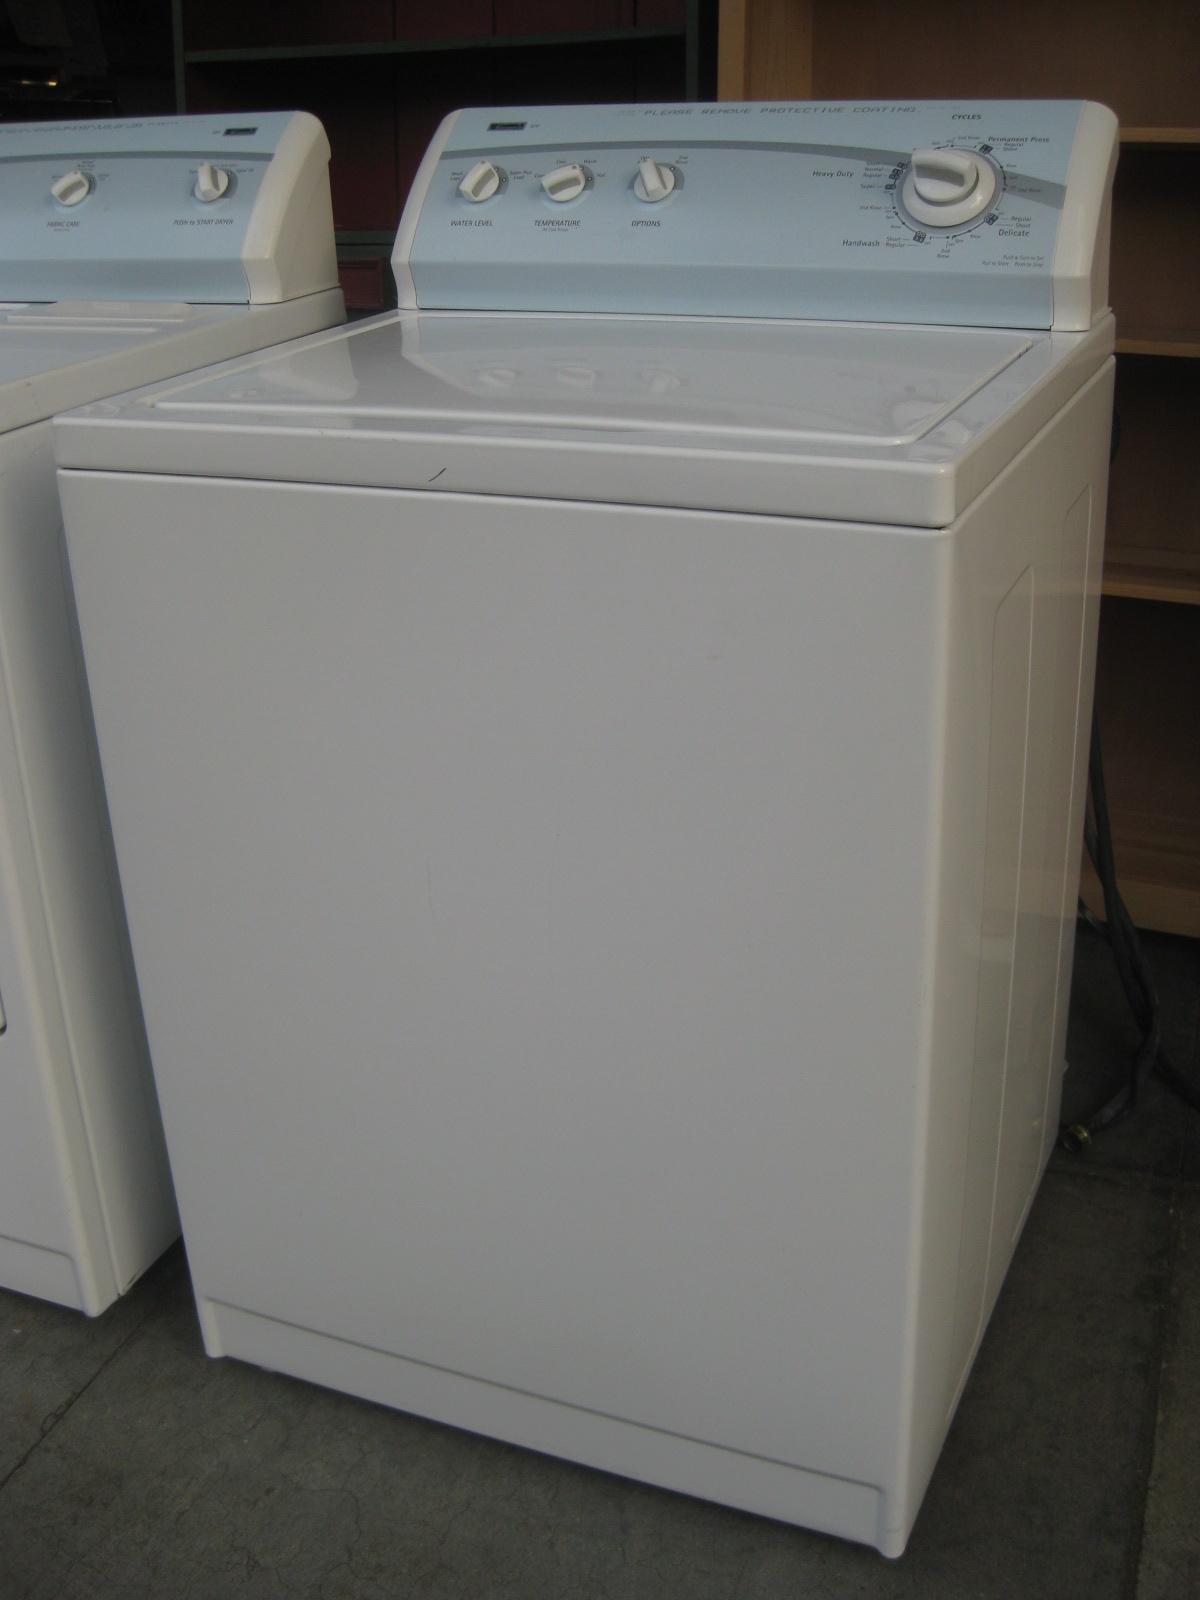 medium resolution of kenmore 70 series washer parts diagram kenmore 110 washer parts lists model 26752503 series 70 kenmore 80 series 110 20892990 transmission